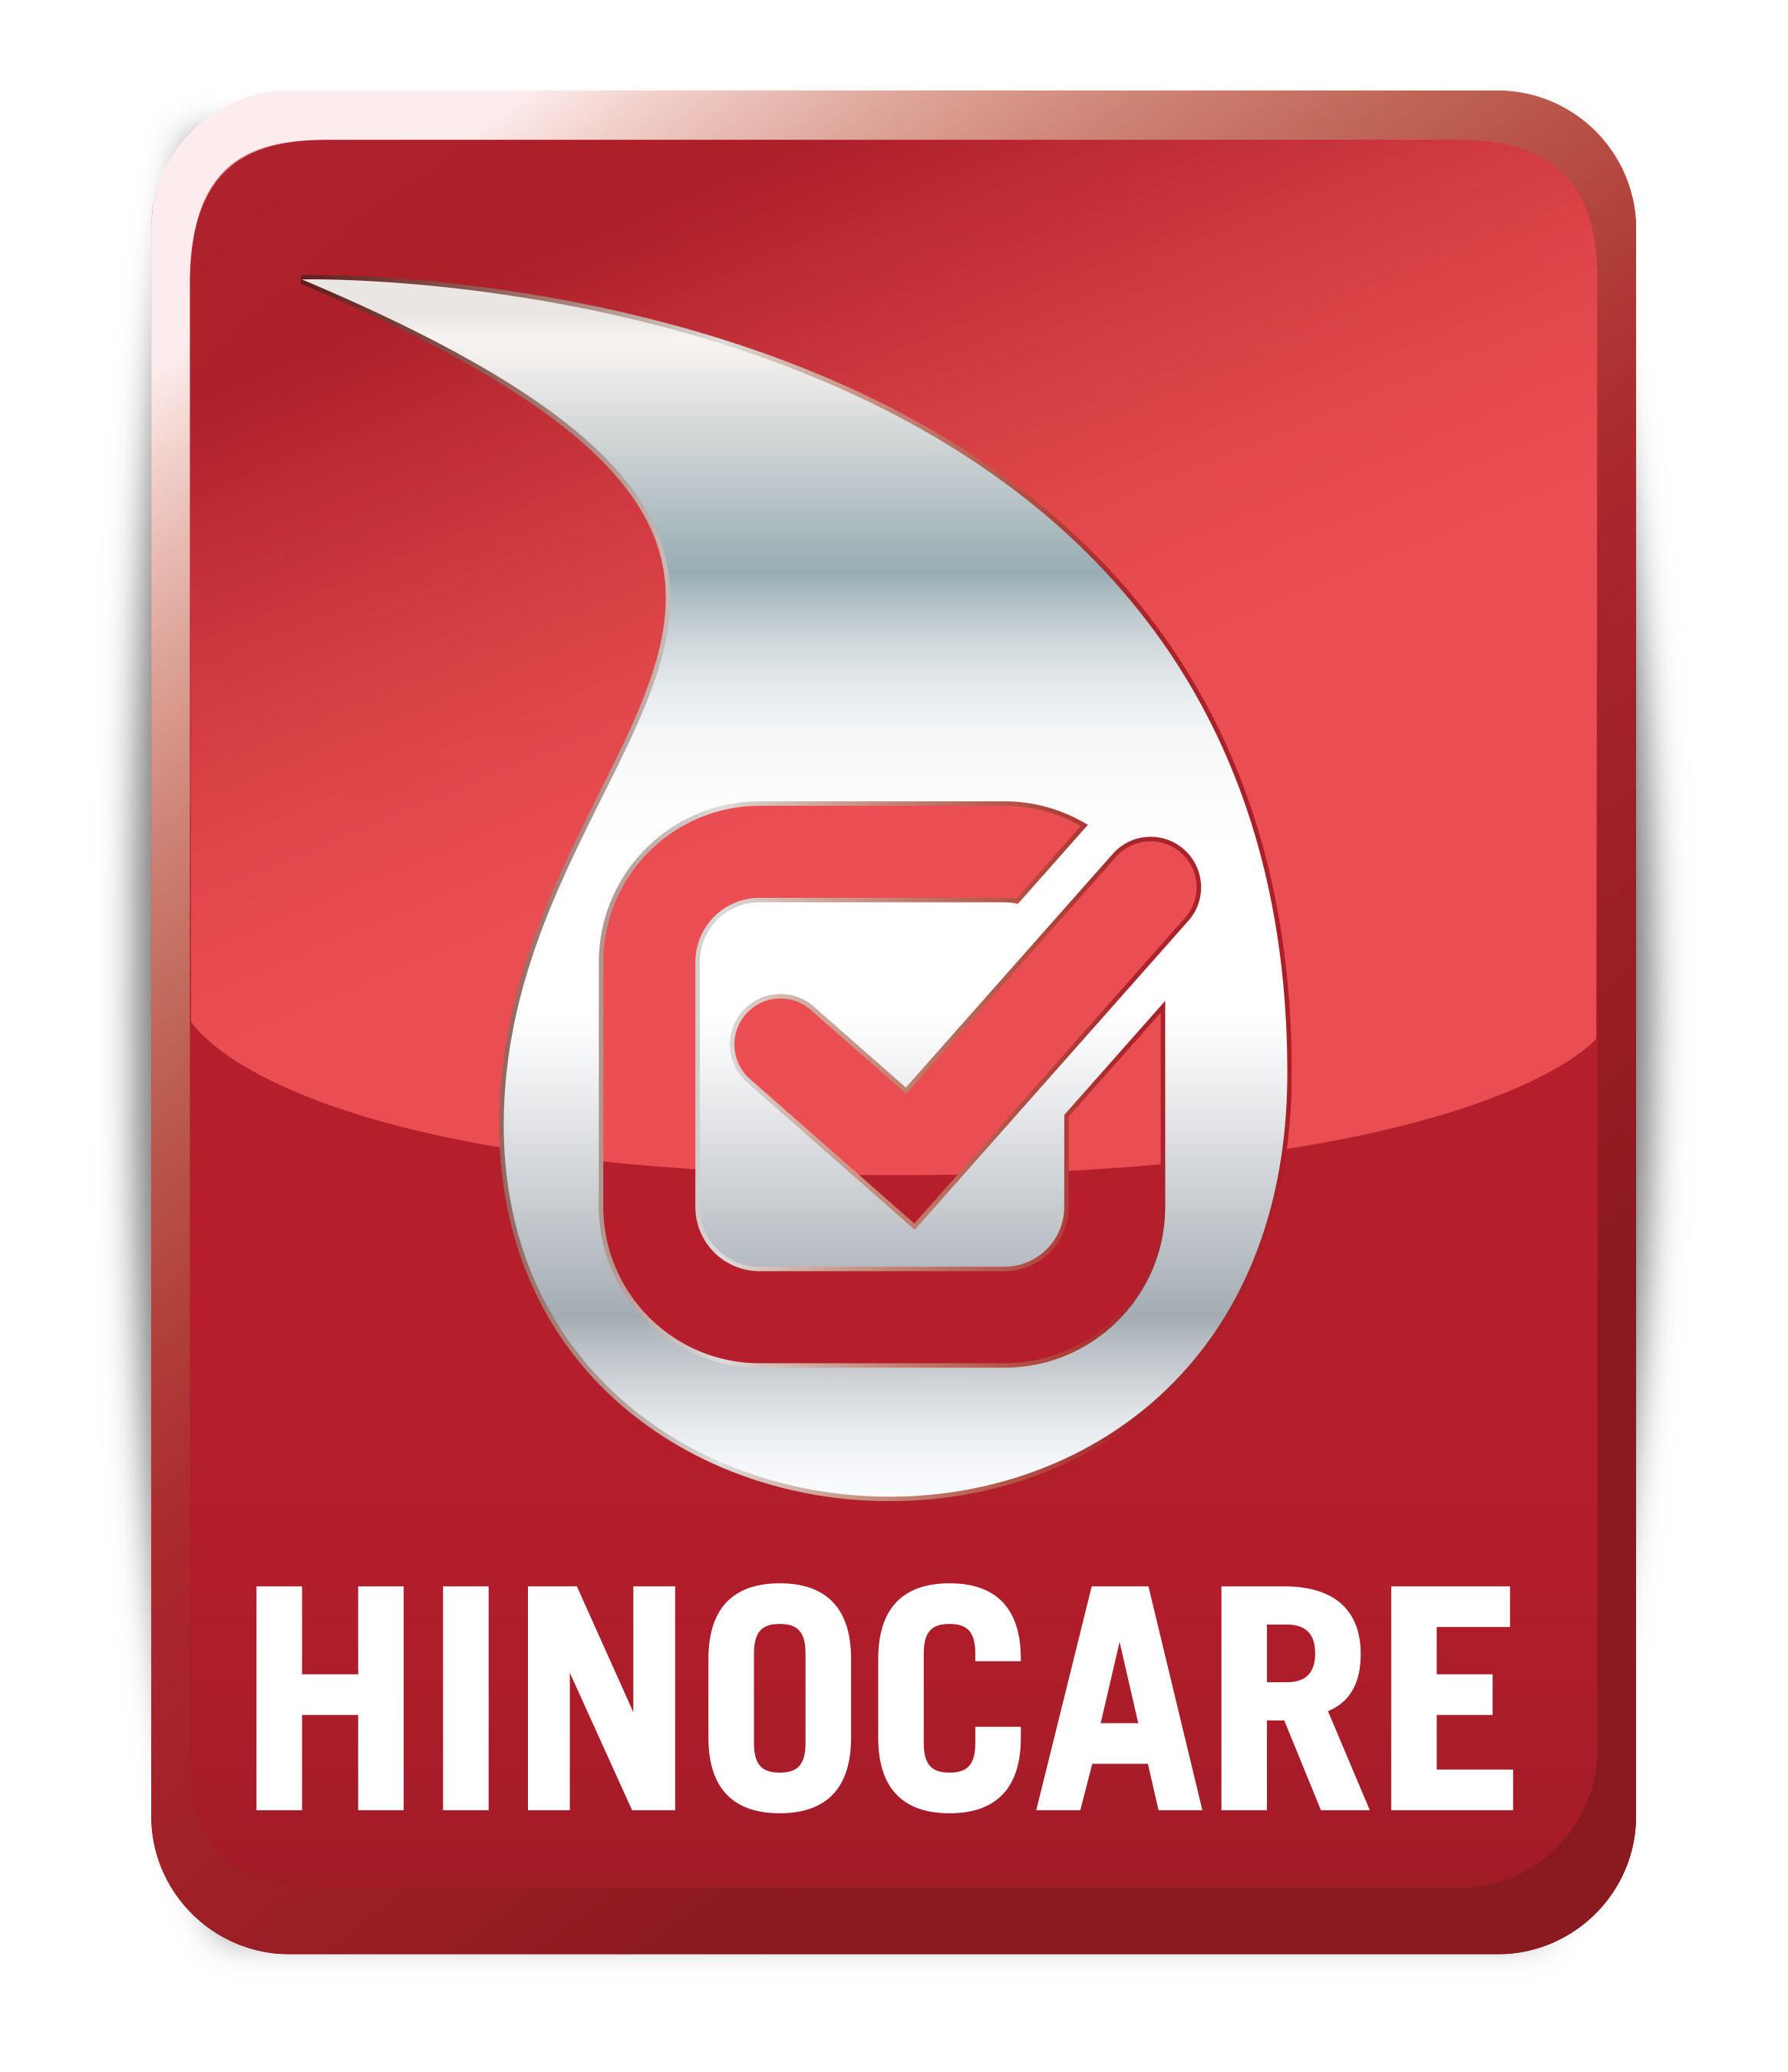 HinoCare